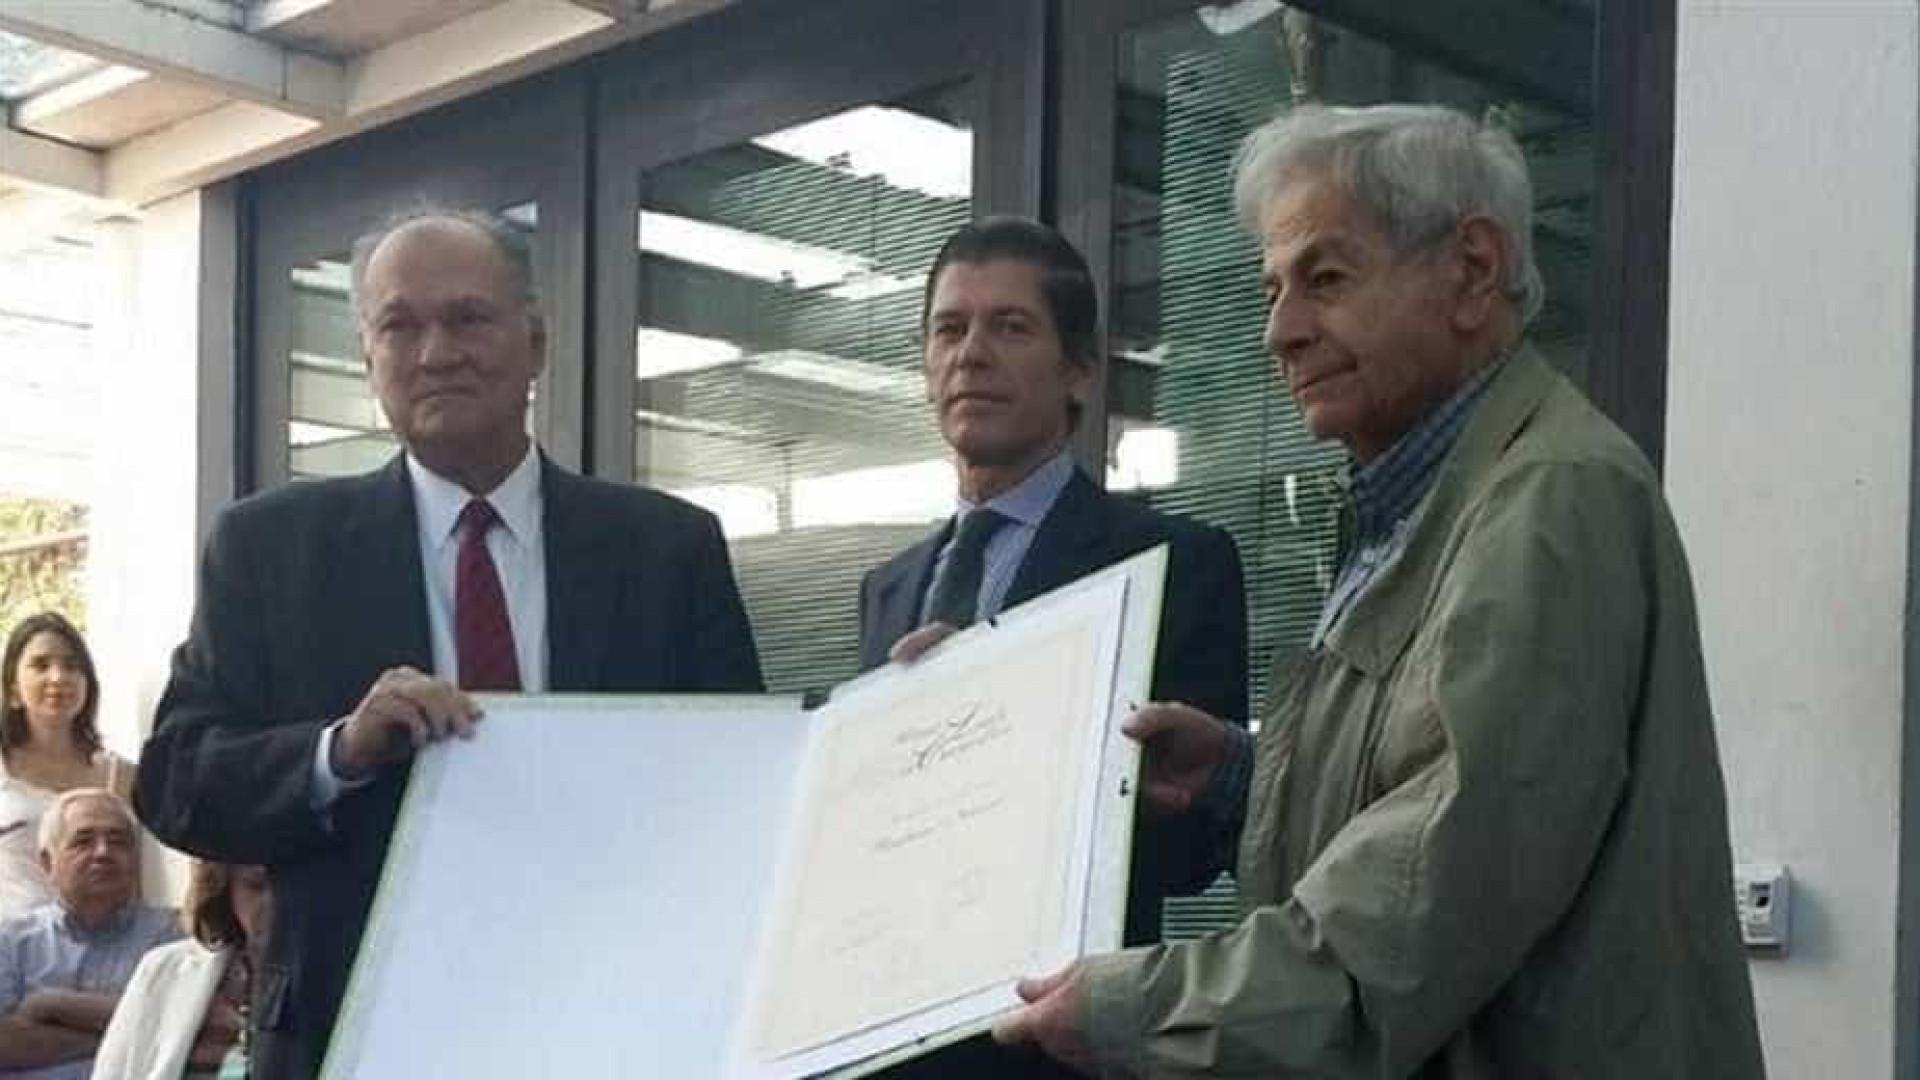 Vaiado, ministro pede que Raduan Nassar devolva Prêmio Camões